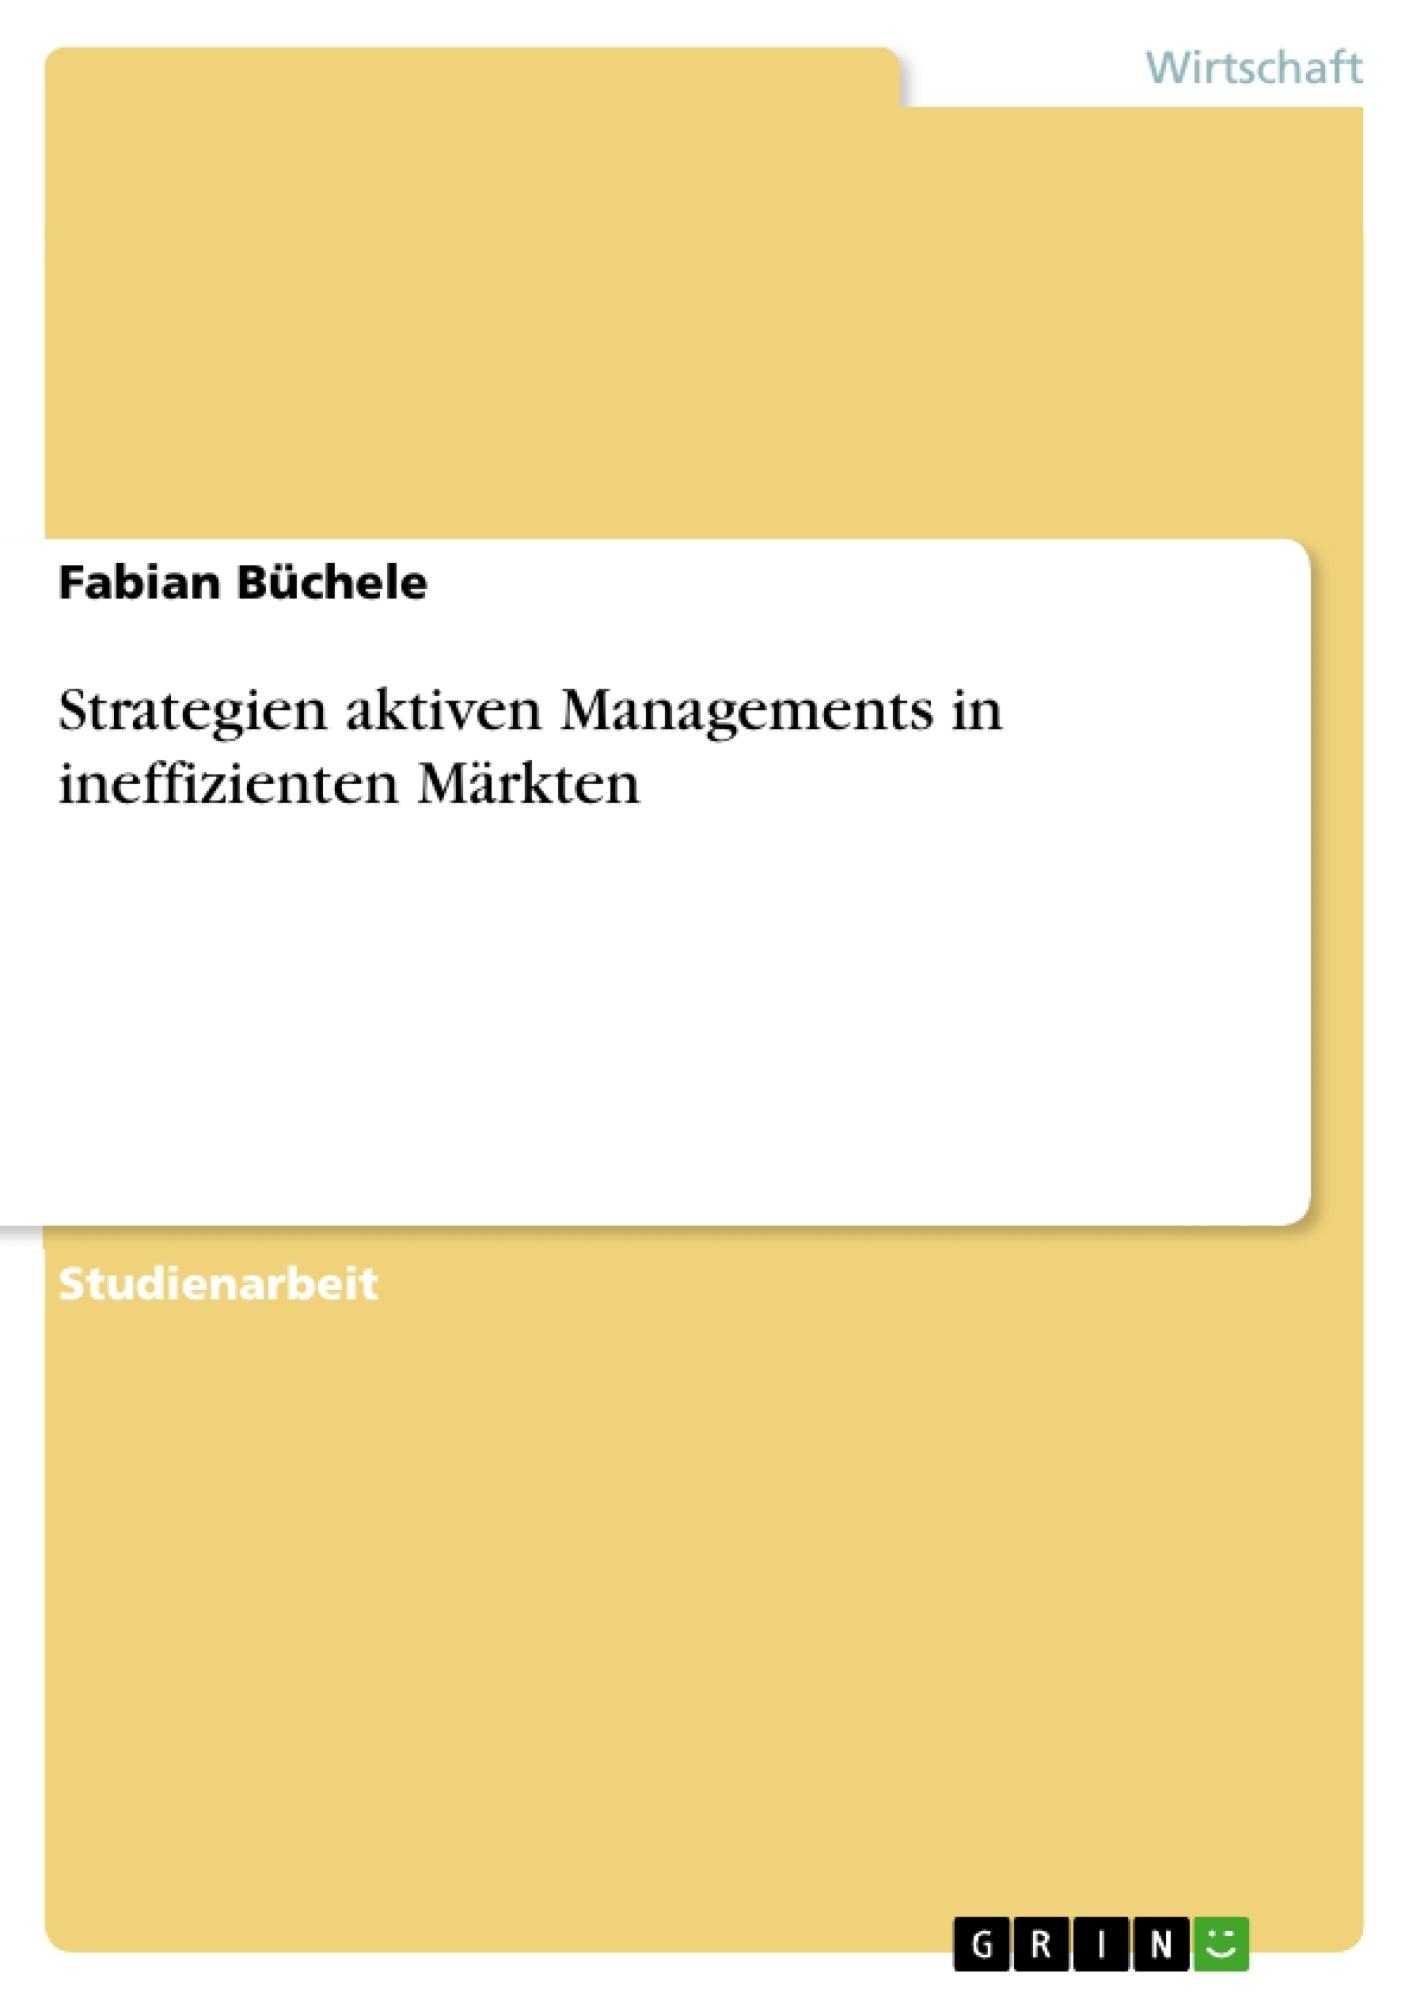 Titel: Strategien aktiven Managements in ineffizienten Märkten